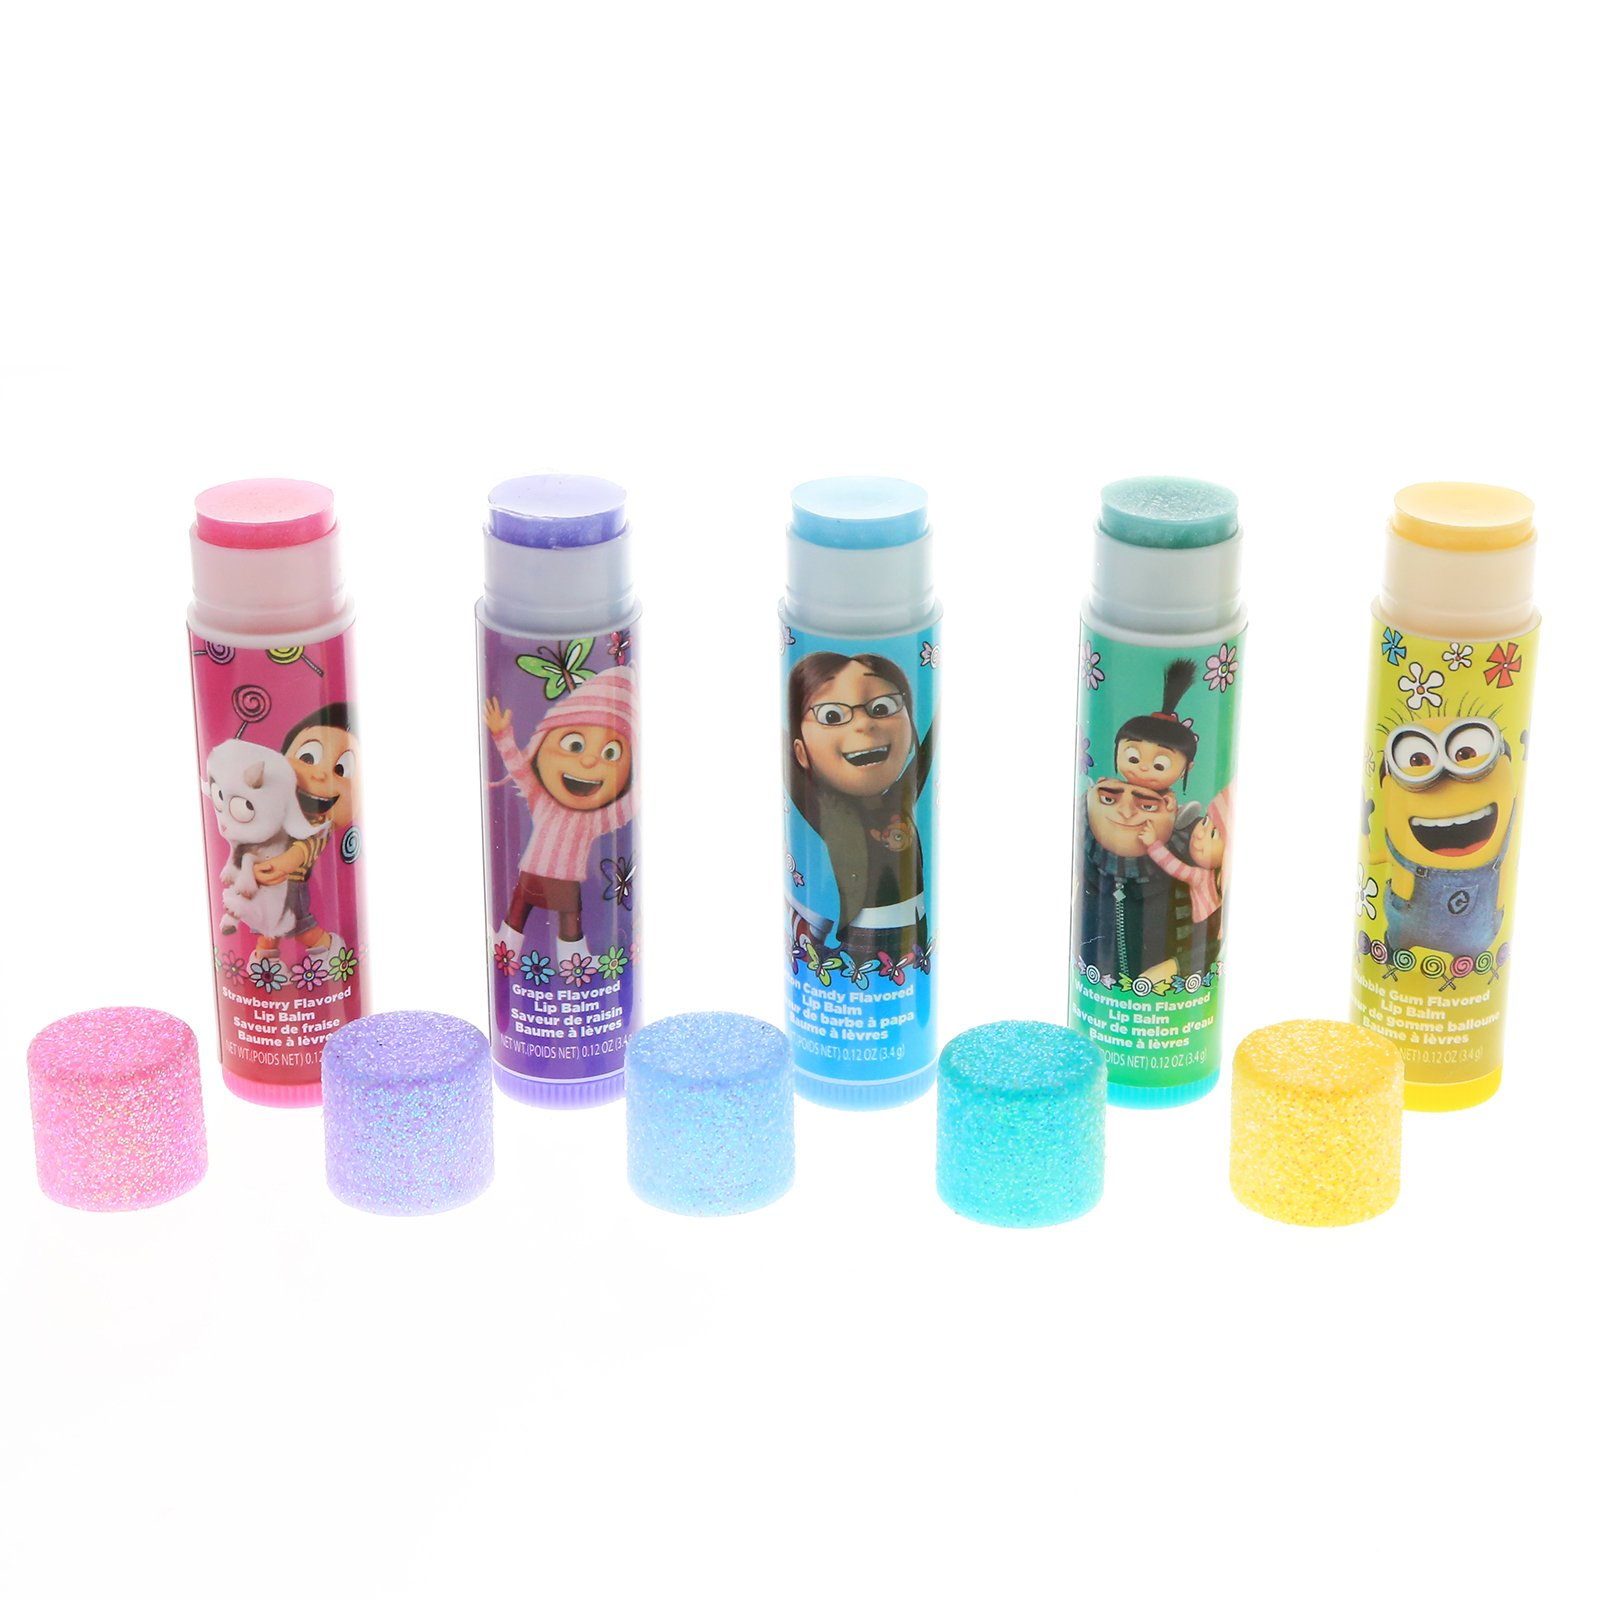 Despicable Me Minions Girls Lip Balm 5pk With Tin Carry Case